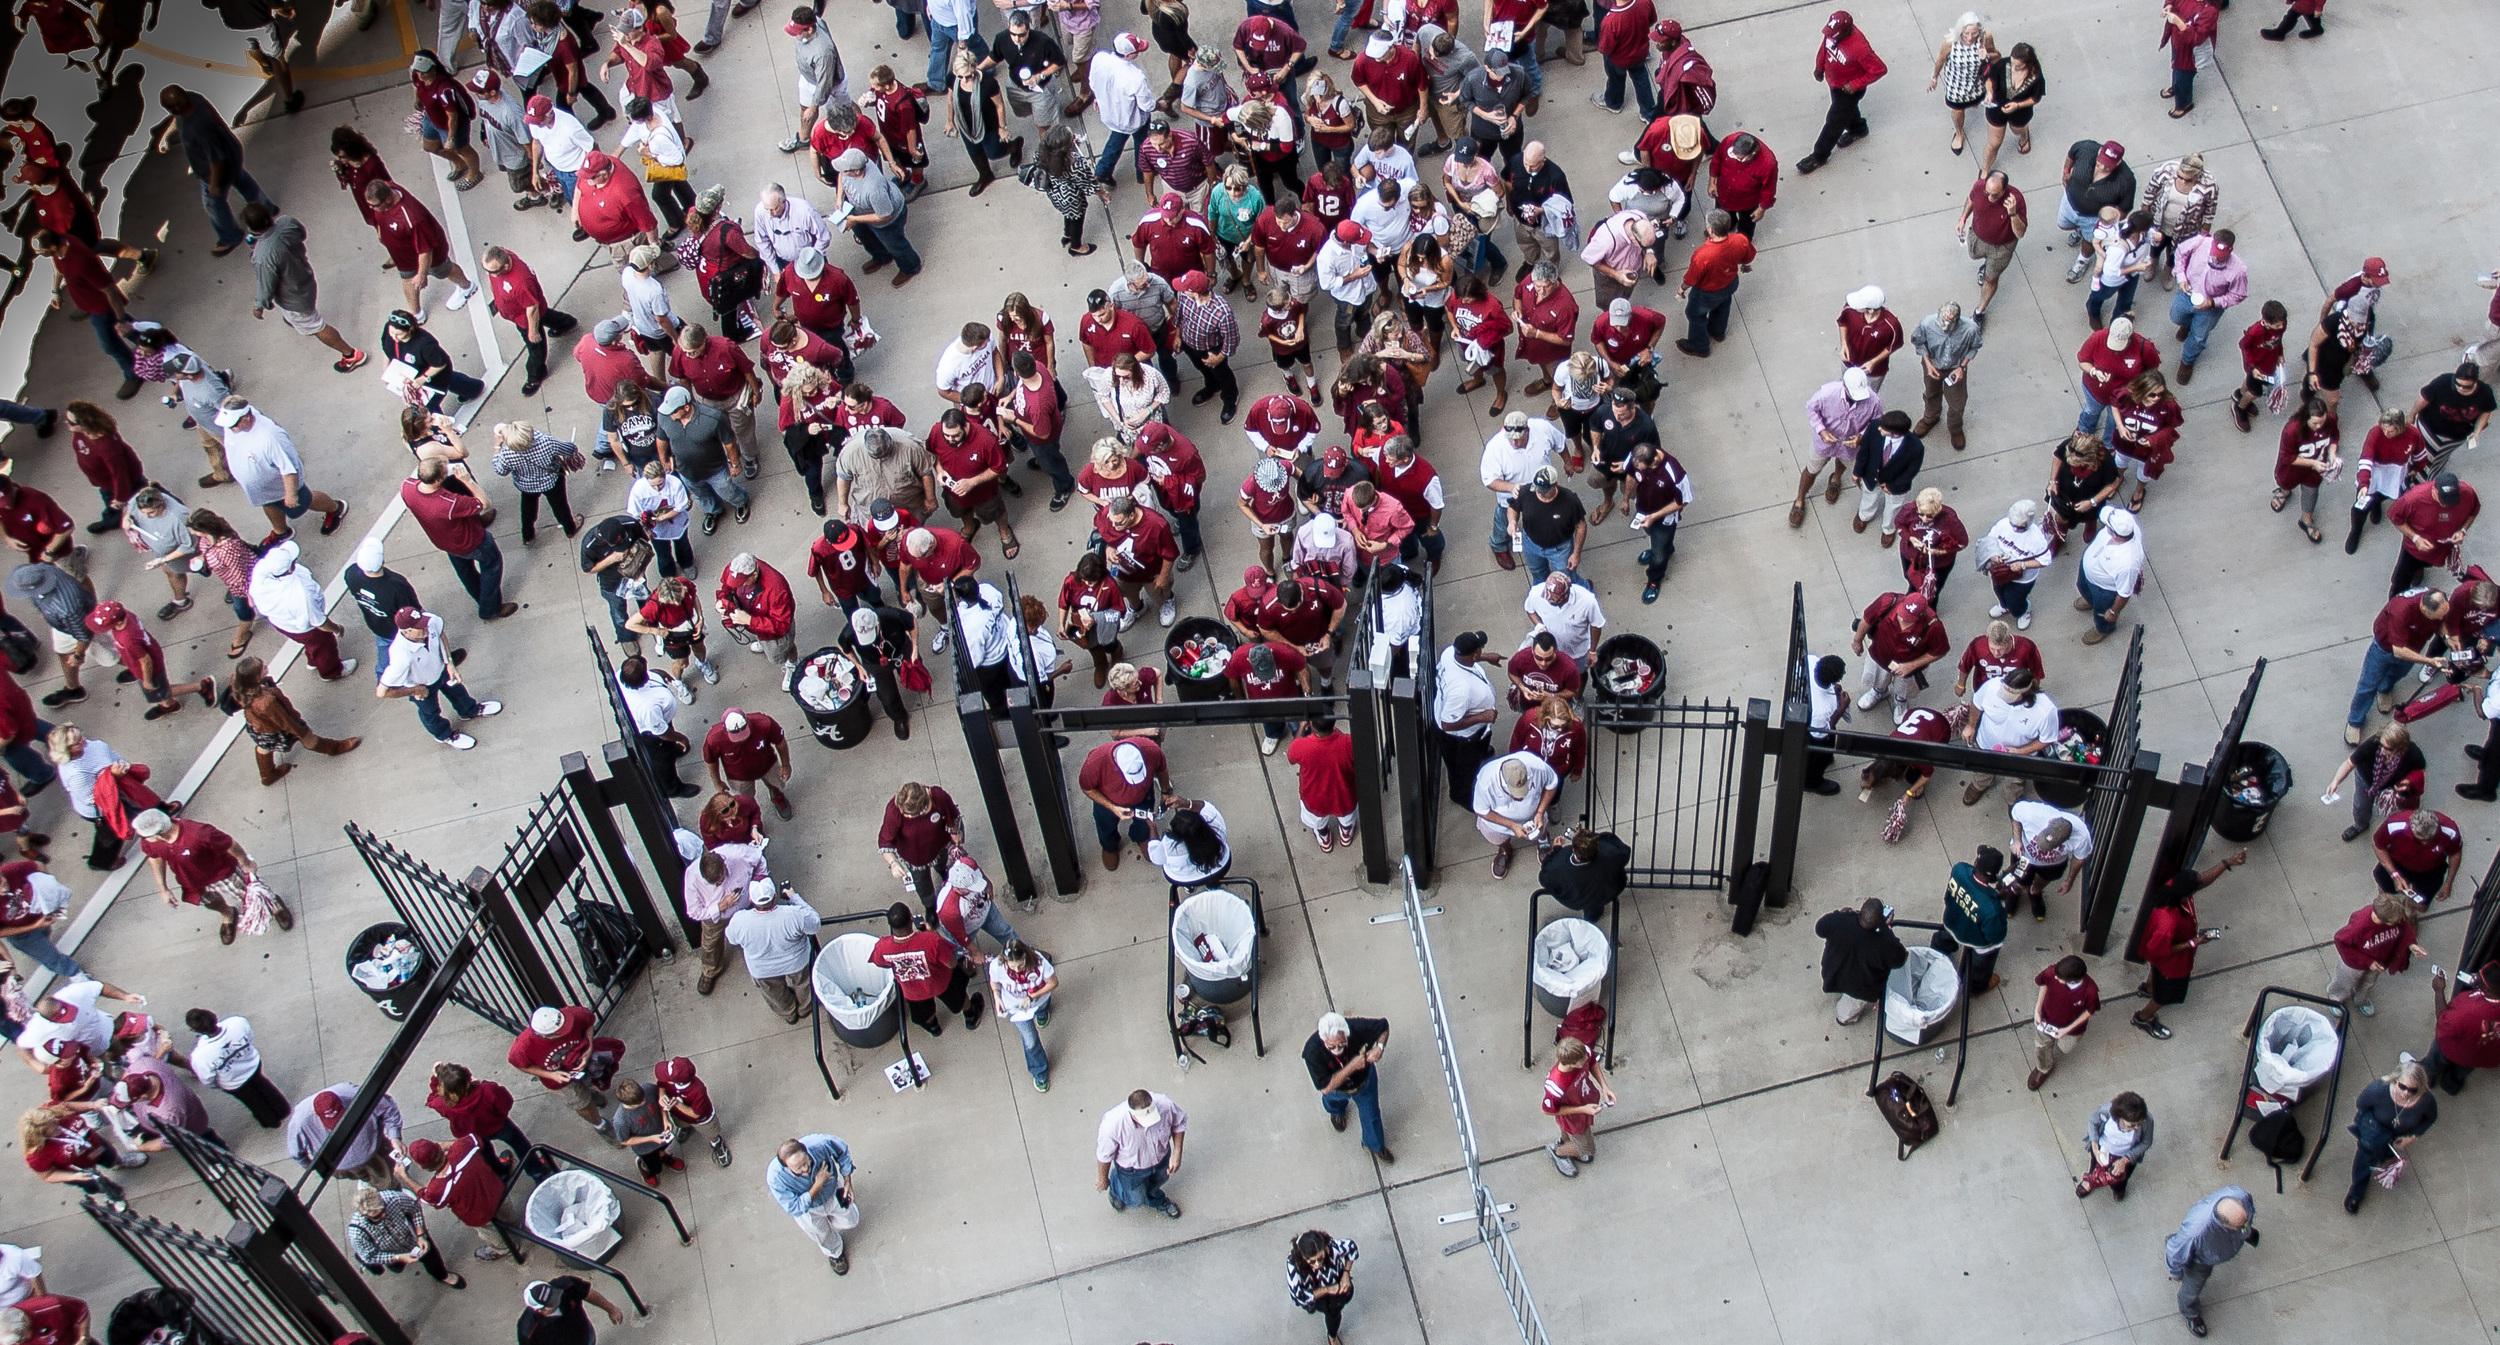 Shot looking down on Crimson Tide fans entering Bryant-Denny Stadium